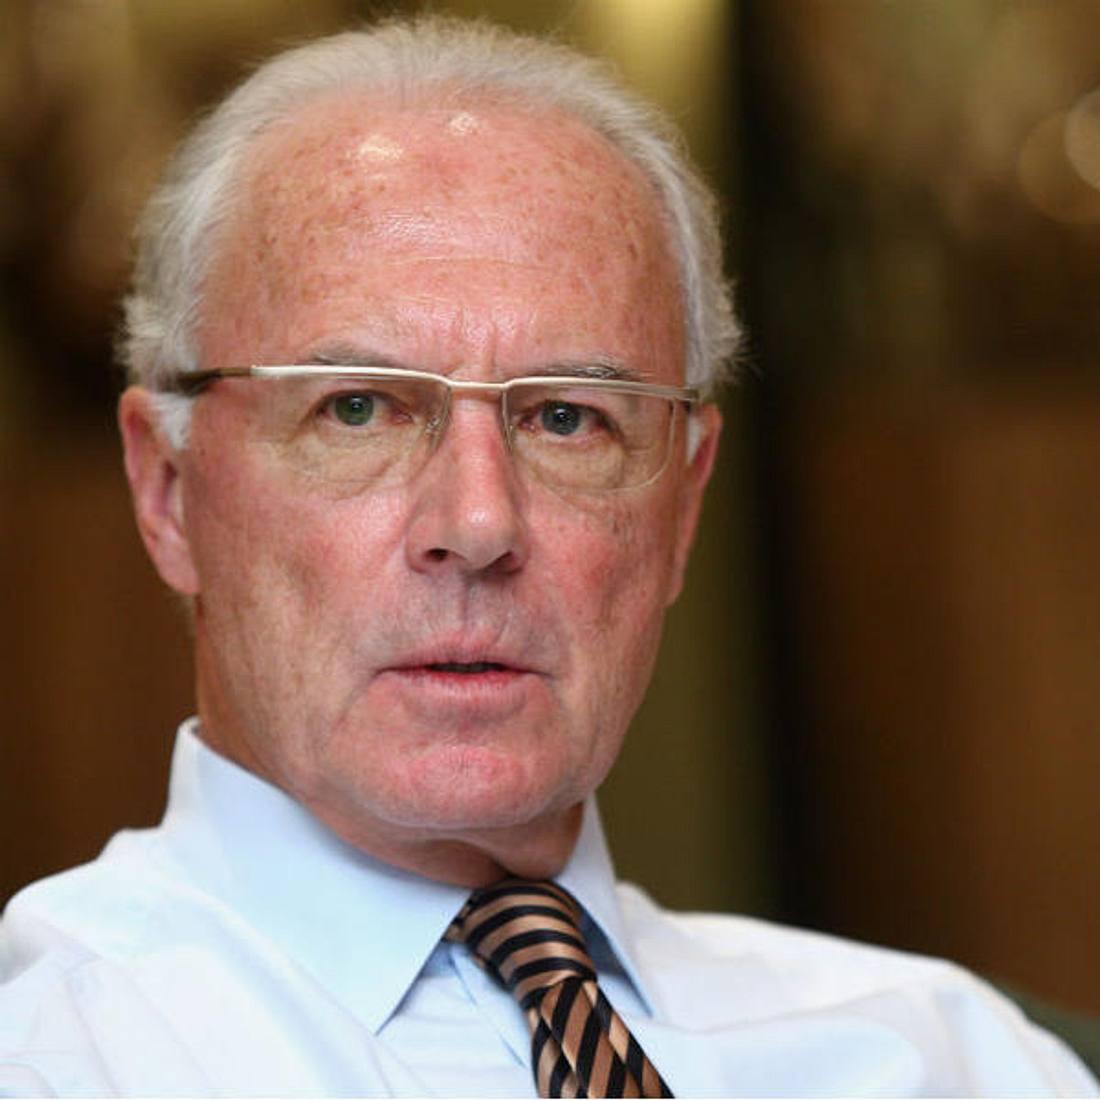 Franz Beckenbauer wurde erneut operiert